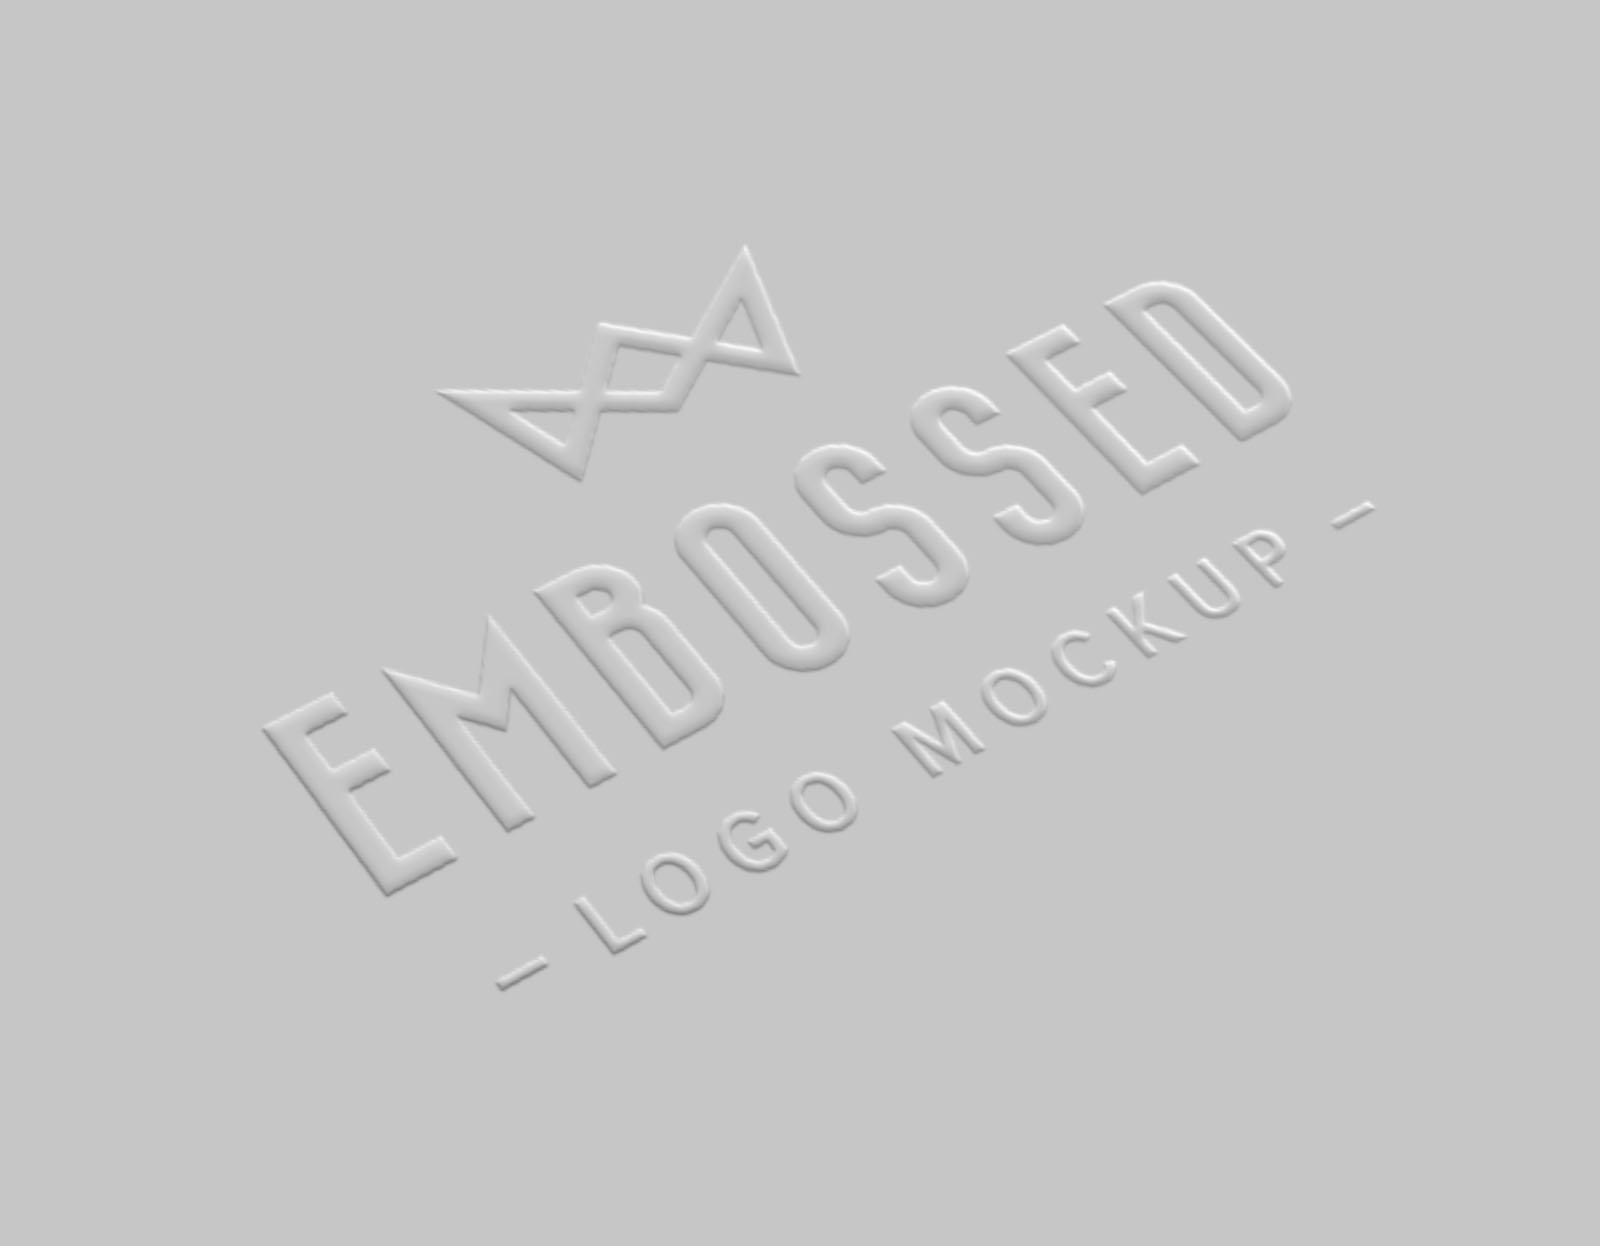 Embossed Realistic Paper Logo Mockup th